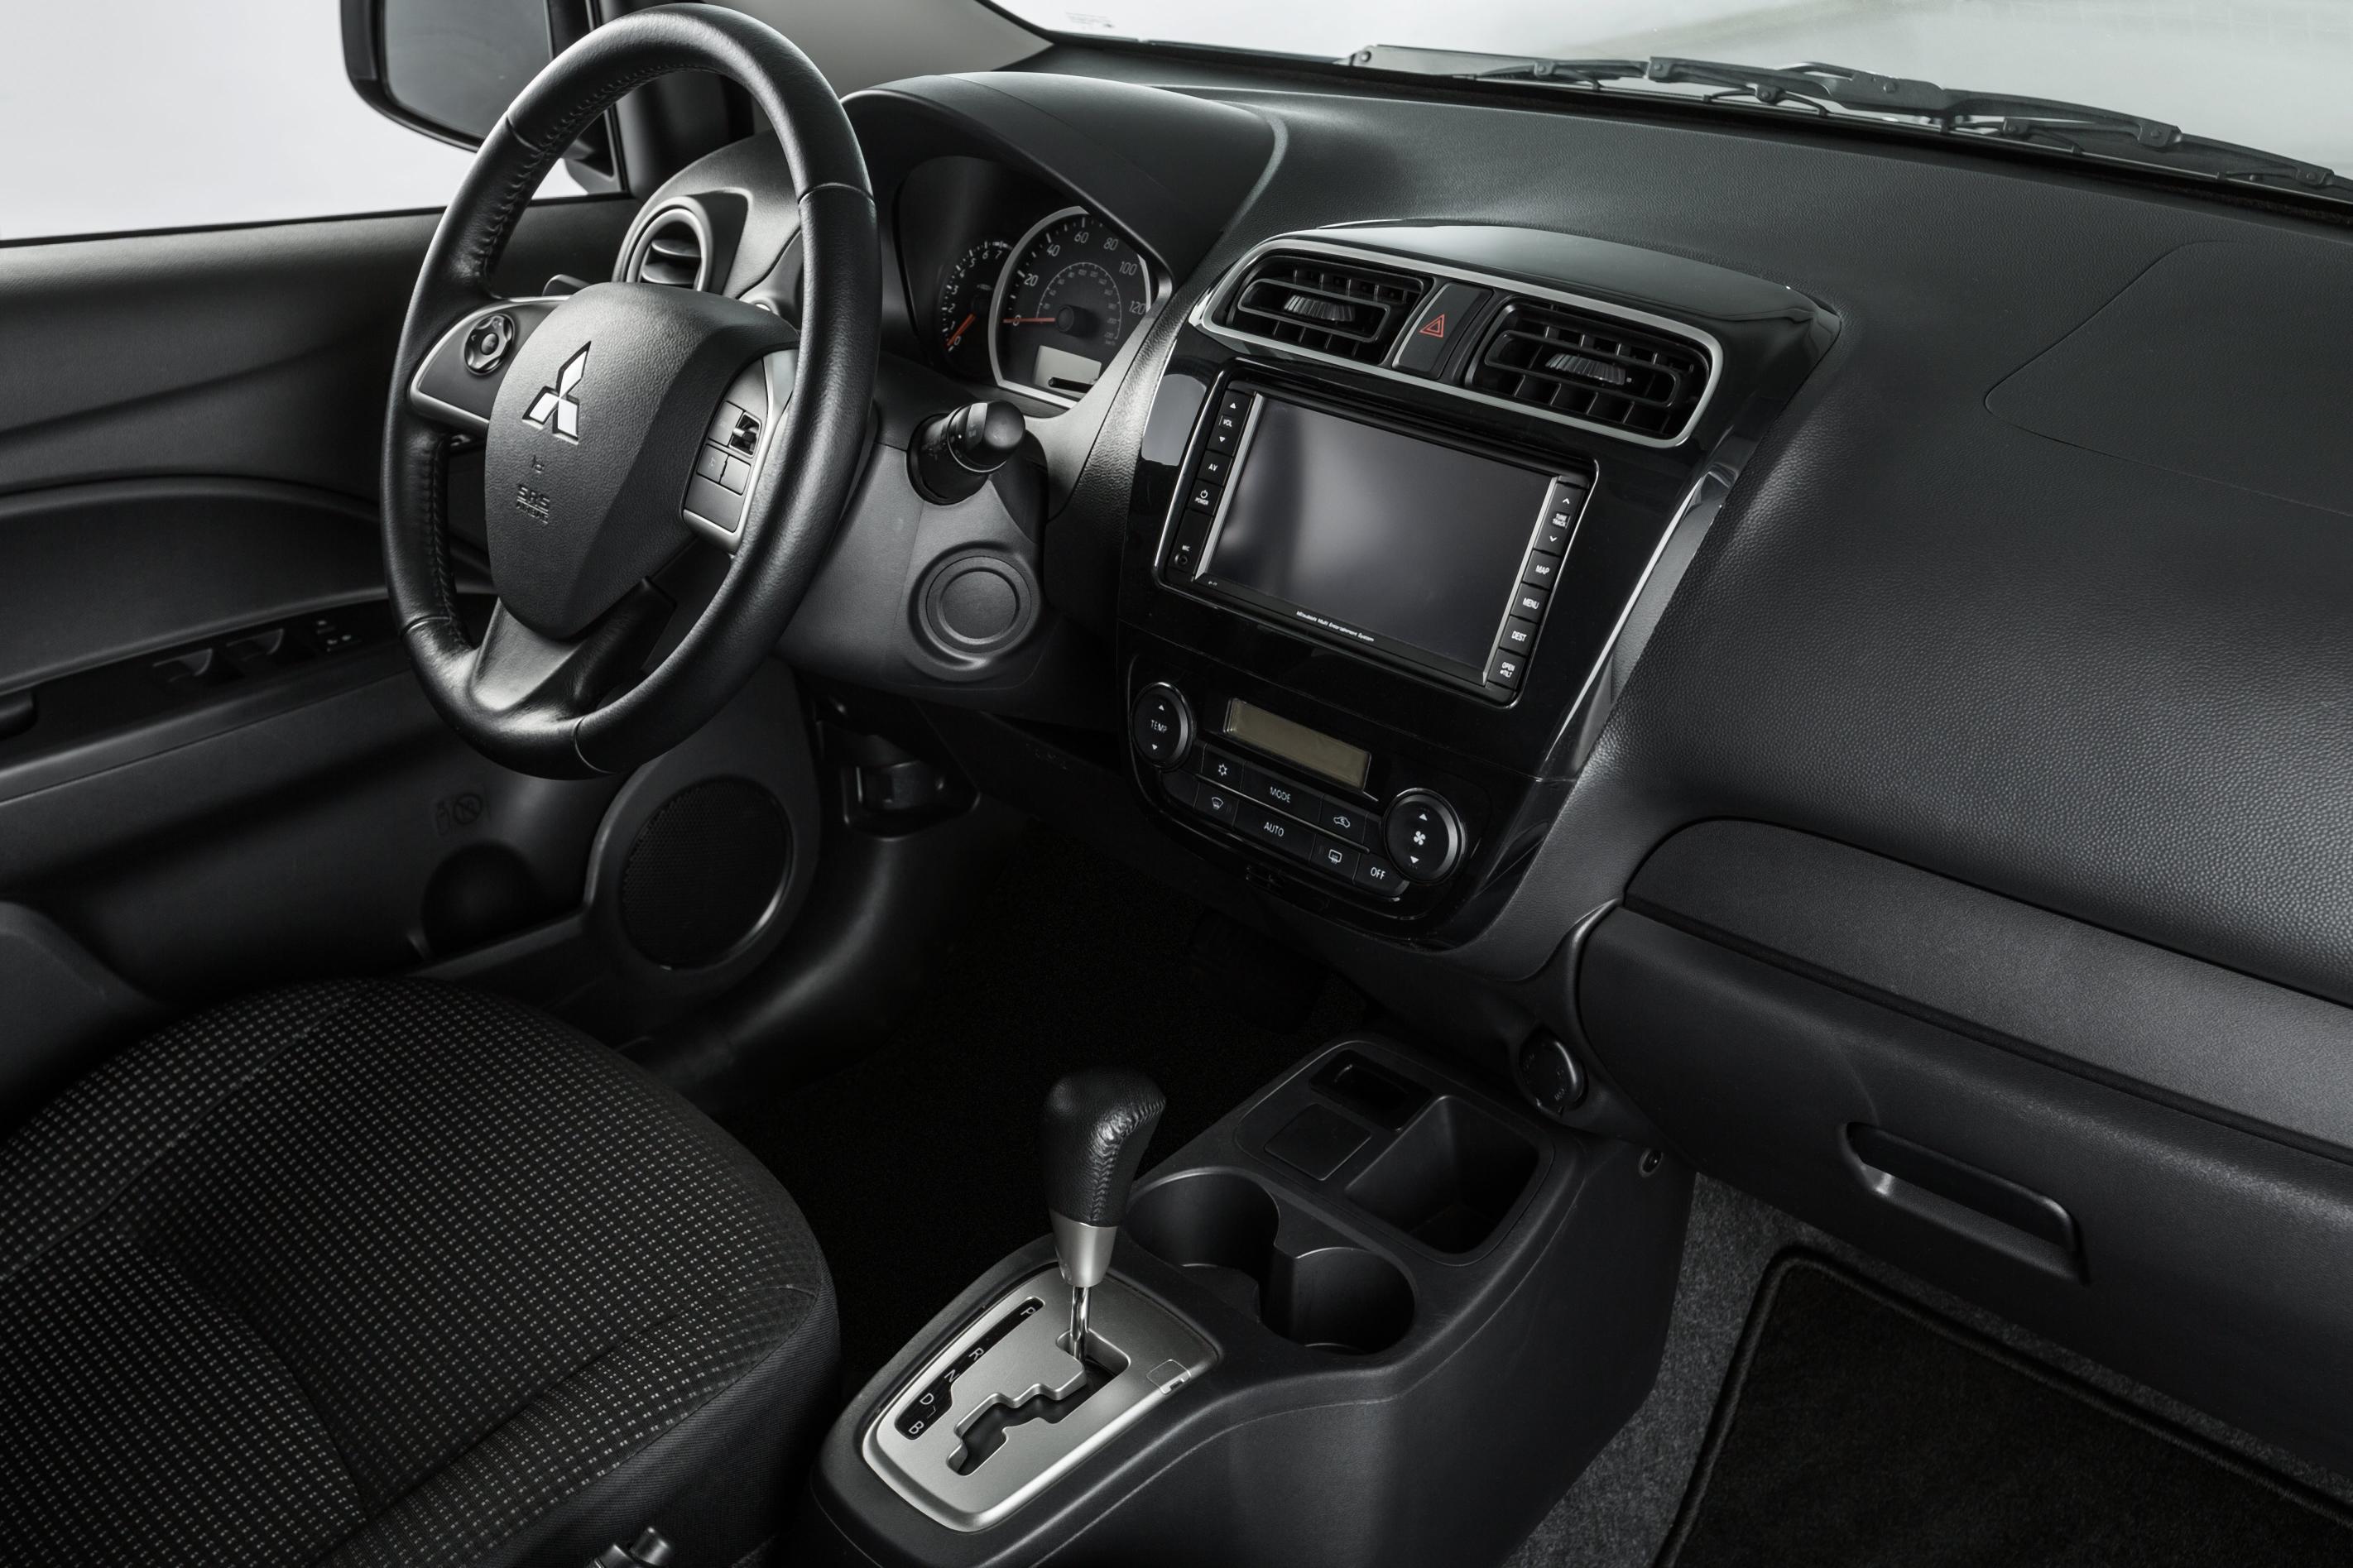 2015 Mitsubishi Mirage Interior Ecoxplorer